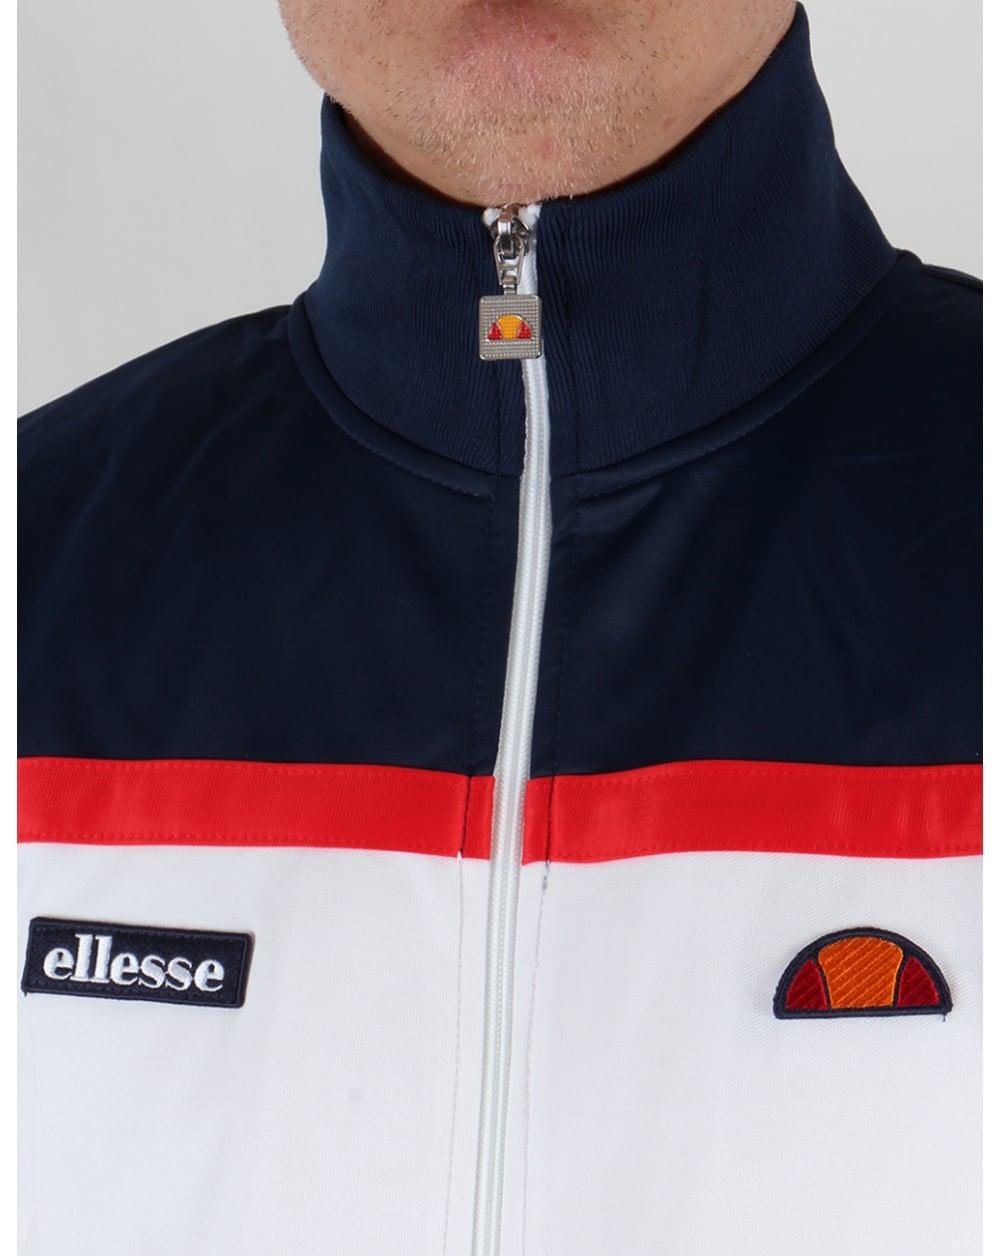 7593cd1c55 Ellesse Moresco Track Top White/navy/red